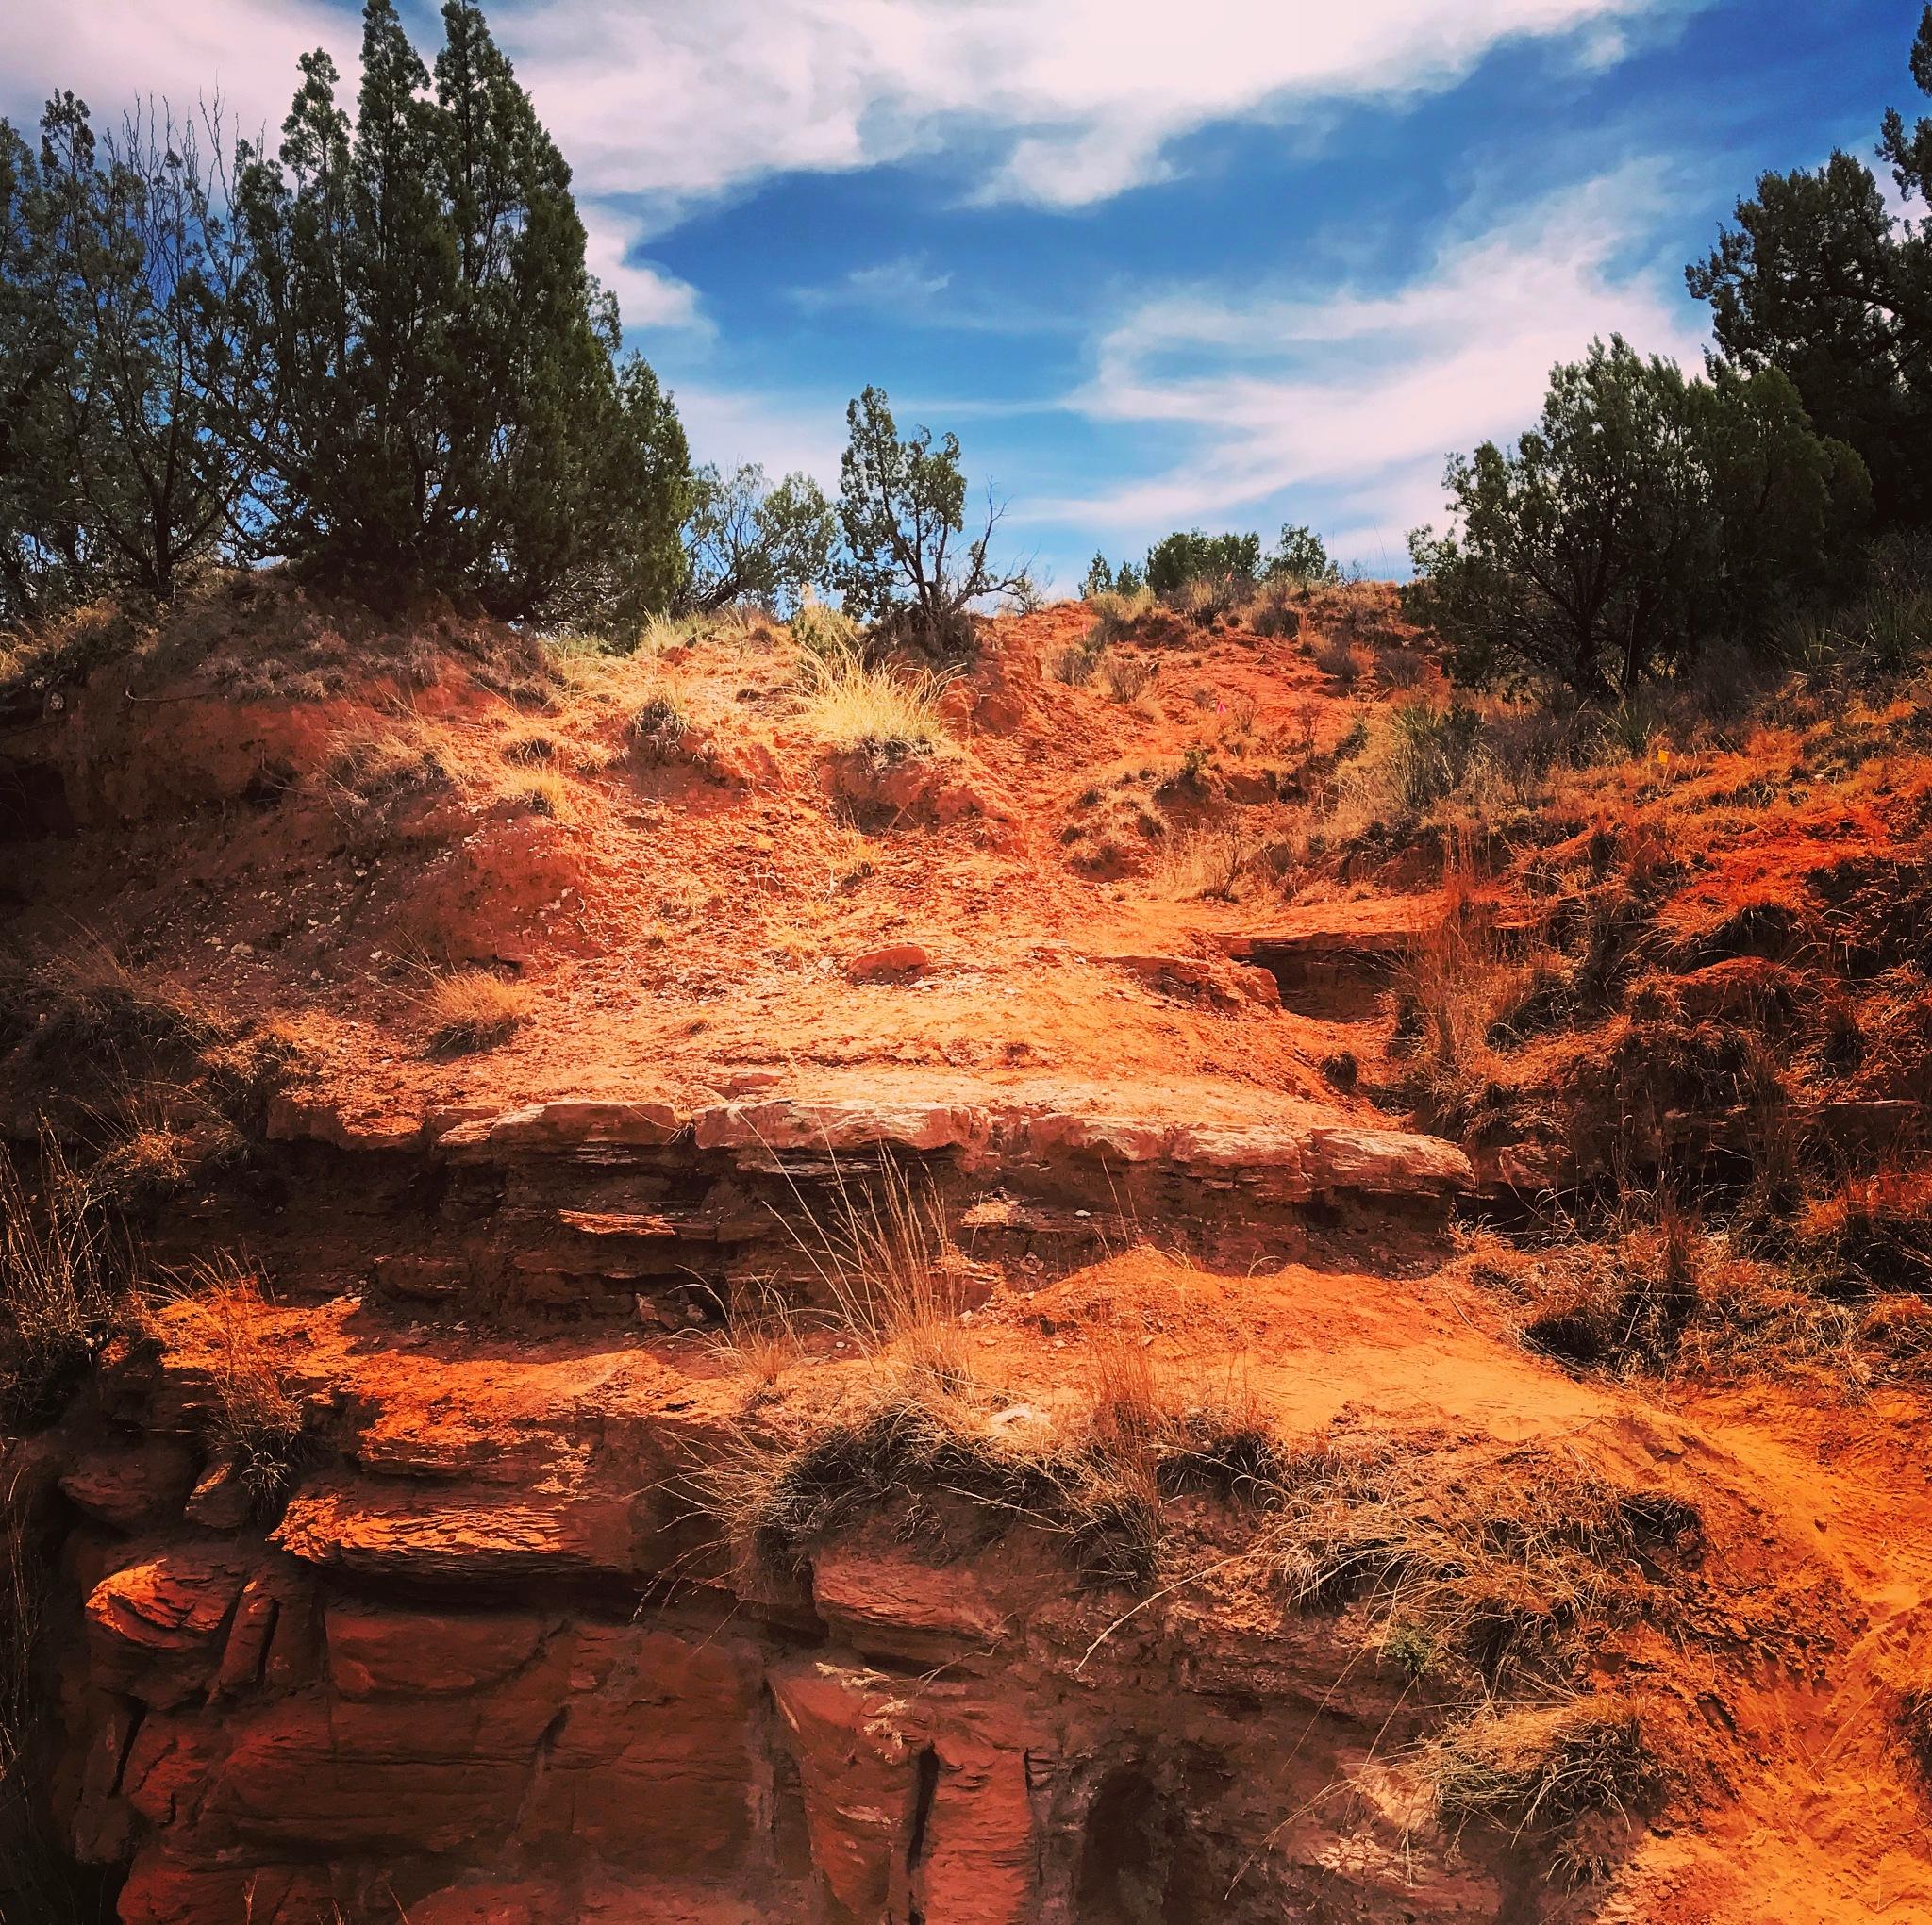 Canyon side by Danae Martinez